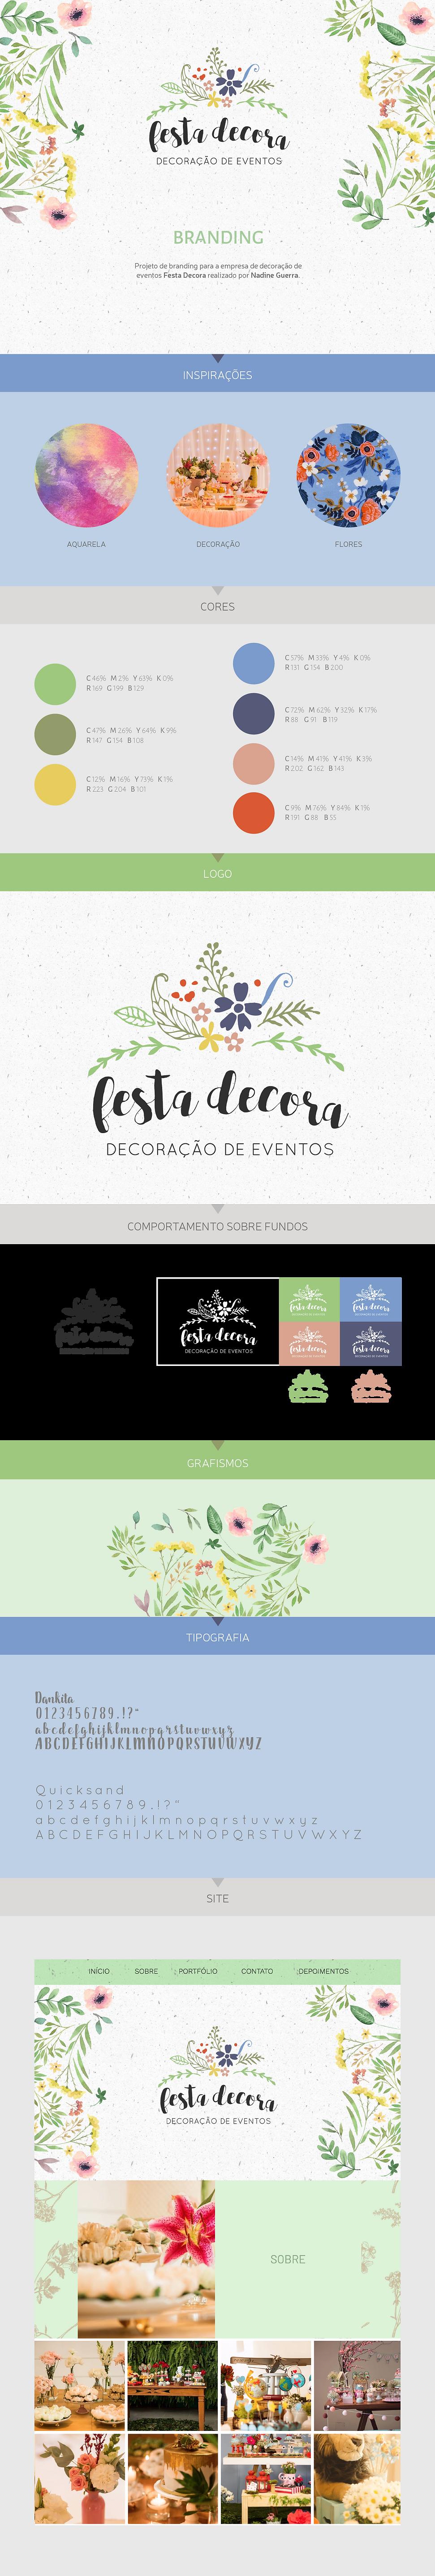 behance_branding festa decora-01.png